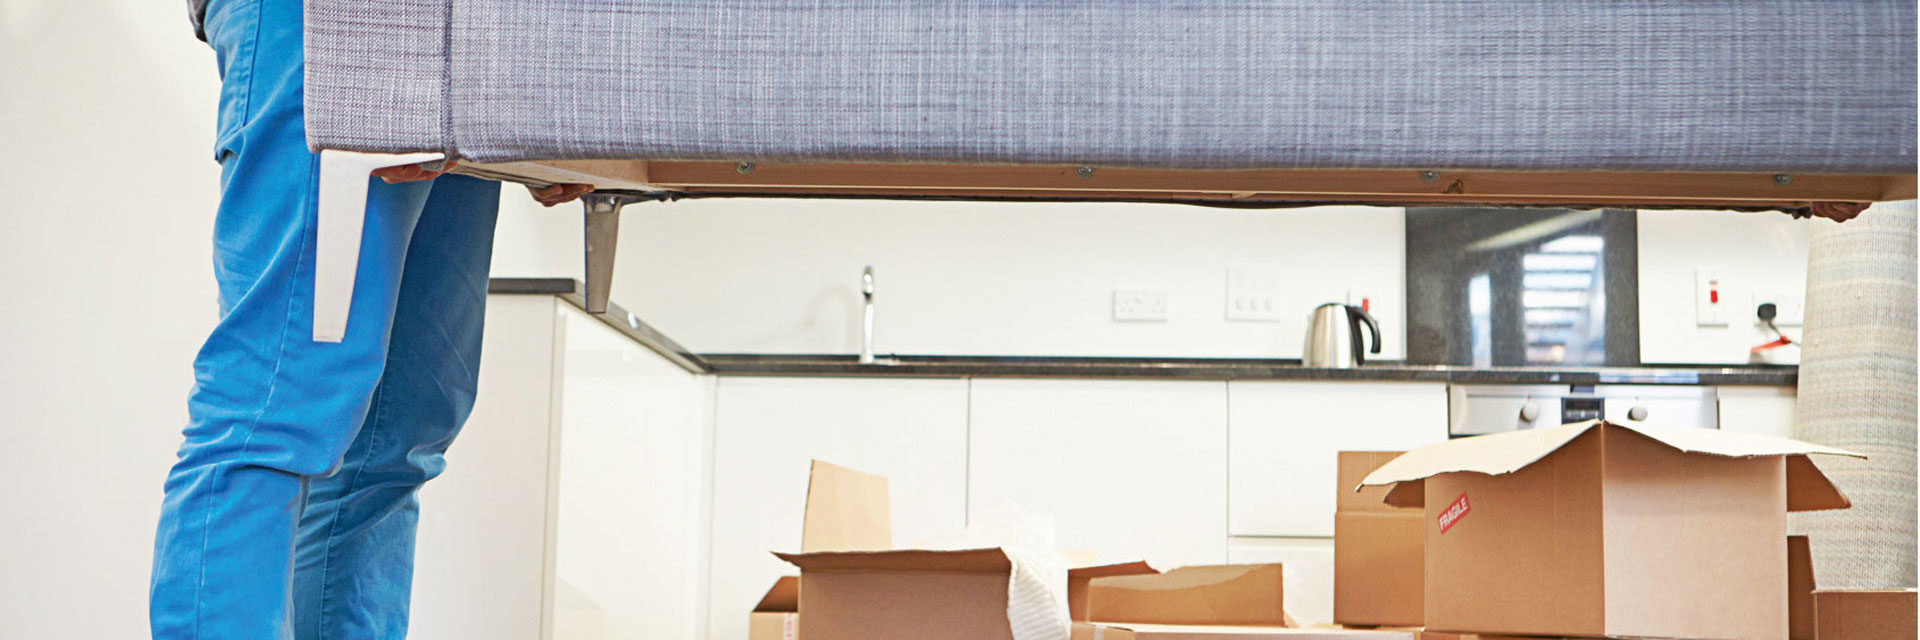 neu in osnabr ck to do 39 s nach dem umzug blog der stadtwerke osnabr ck. Black Bedroom Furniture Sets. Home Design Ideas